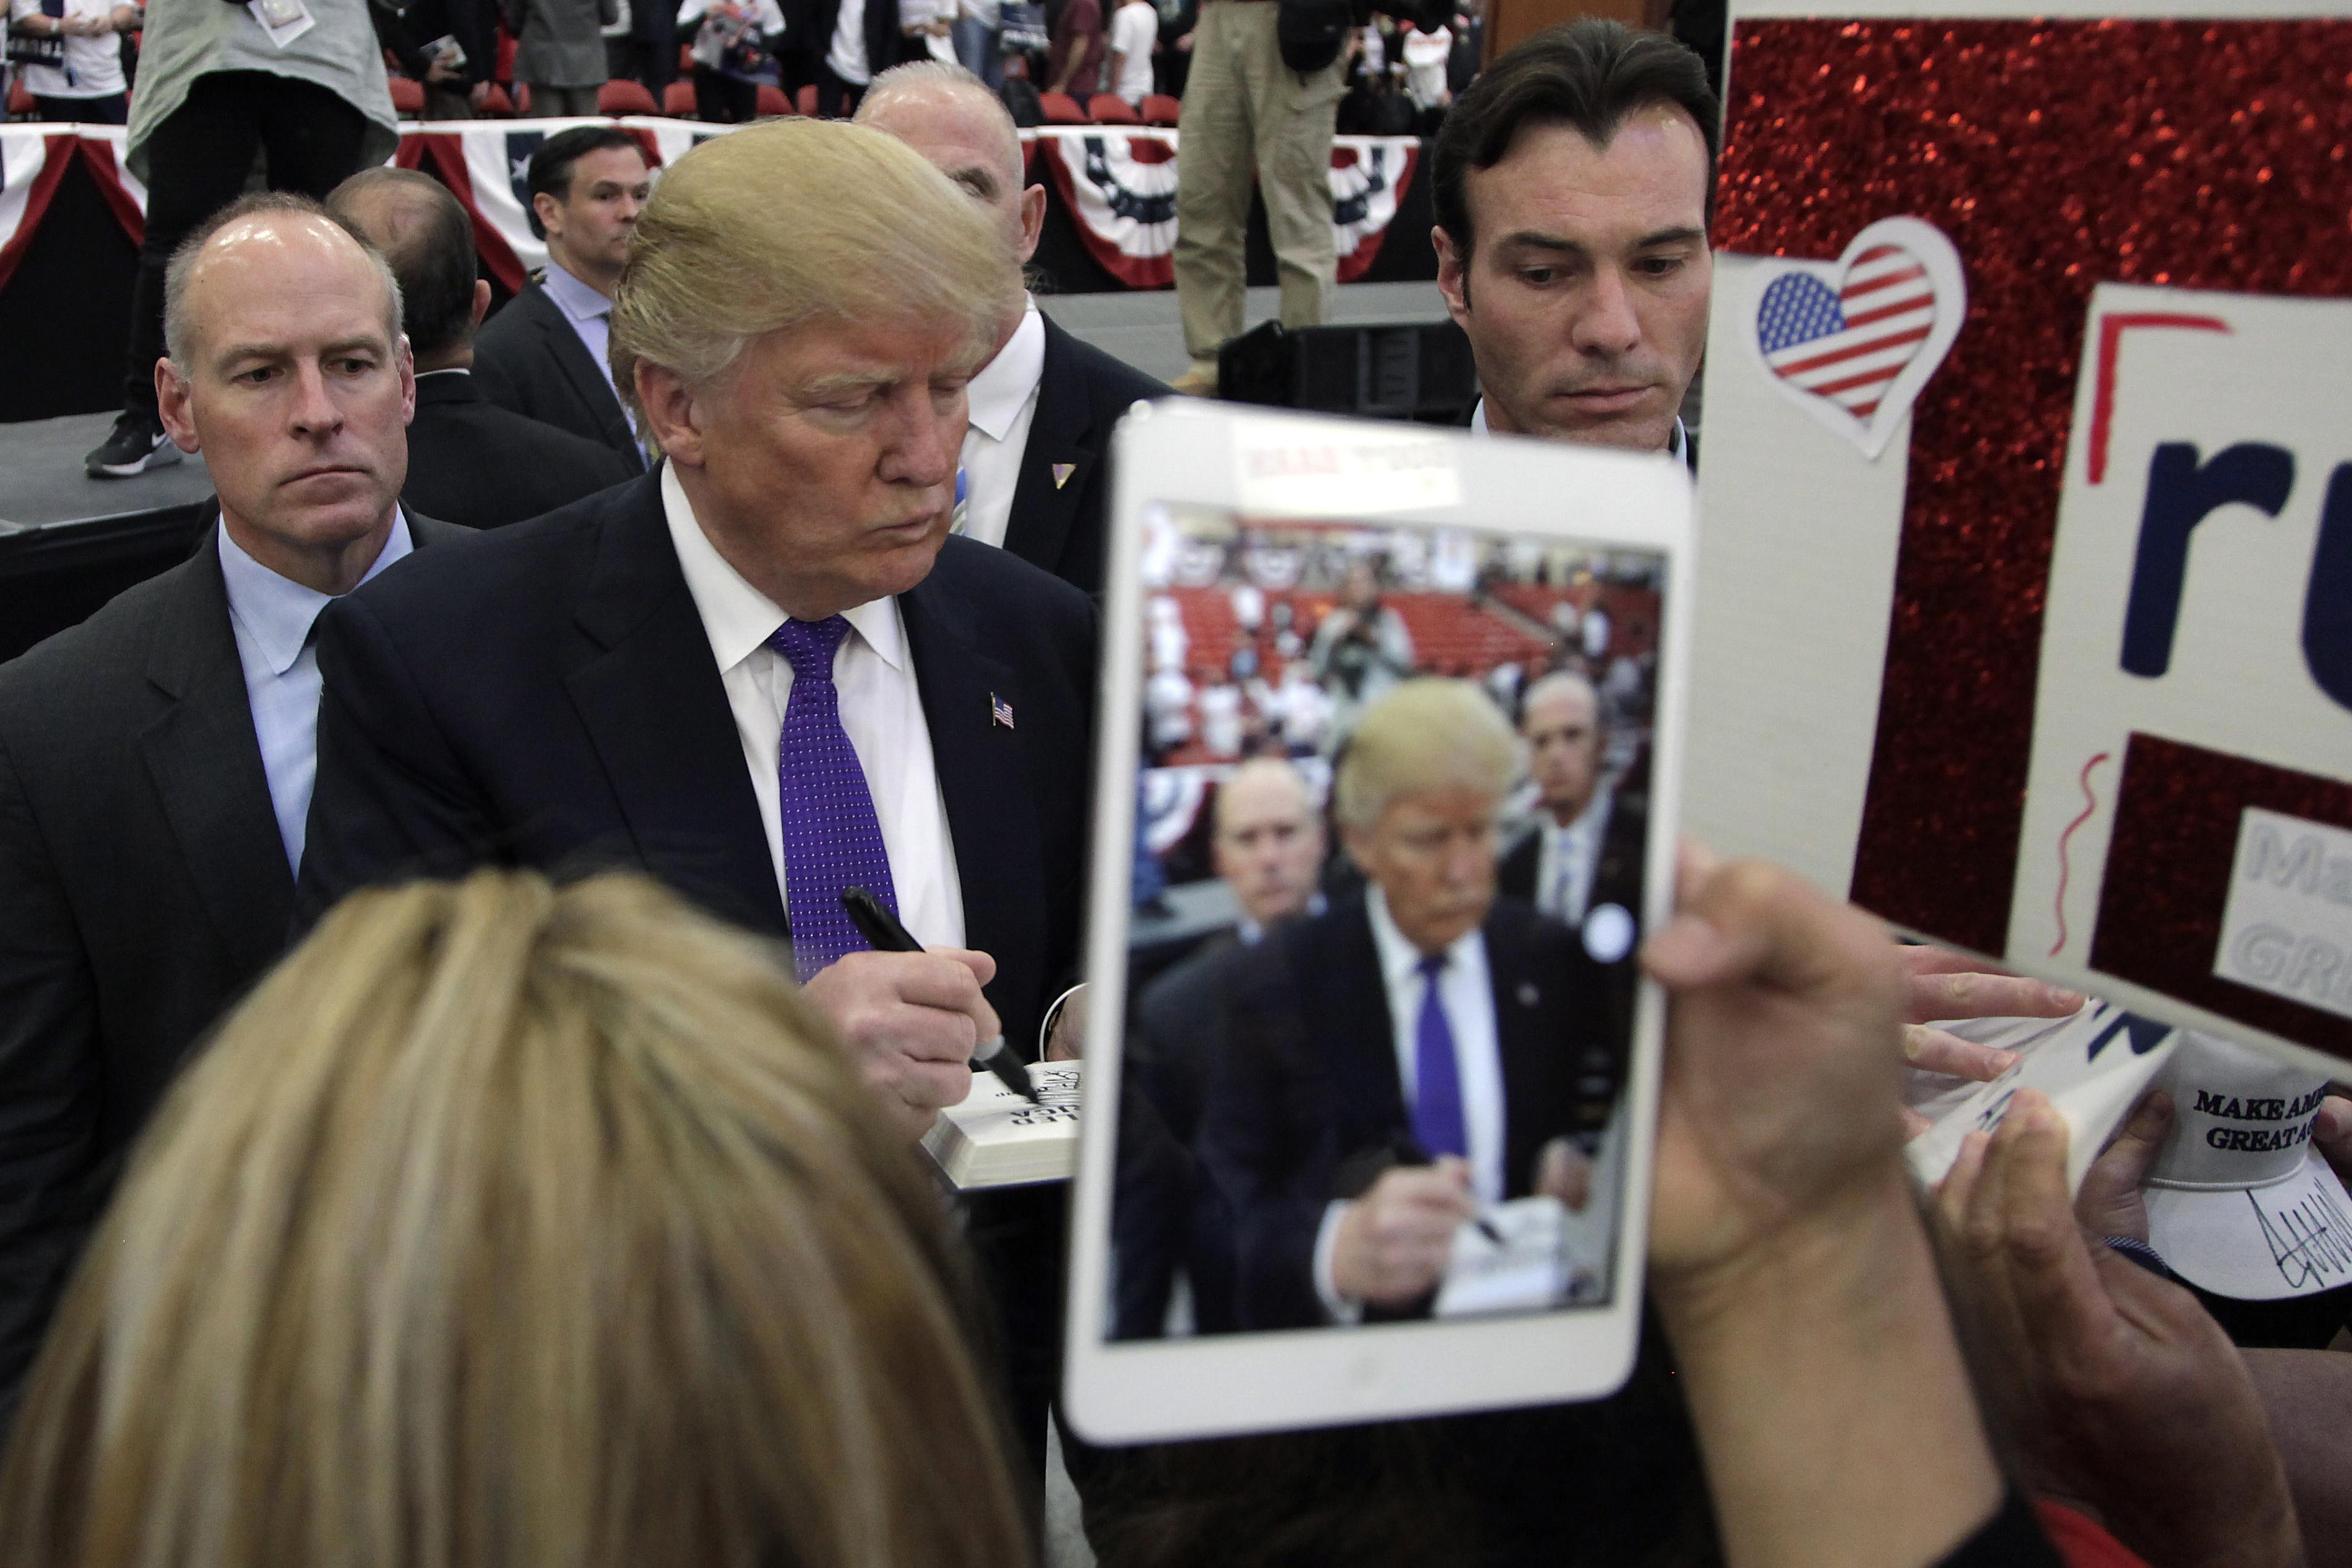 Donald Trump firma autógrafos al término de su evento en Las Vegas, Nevada